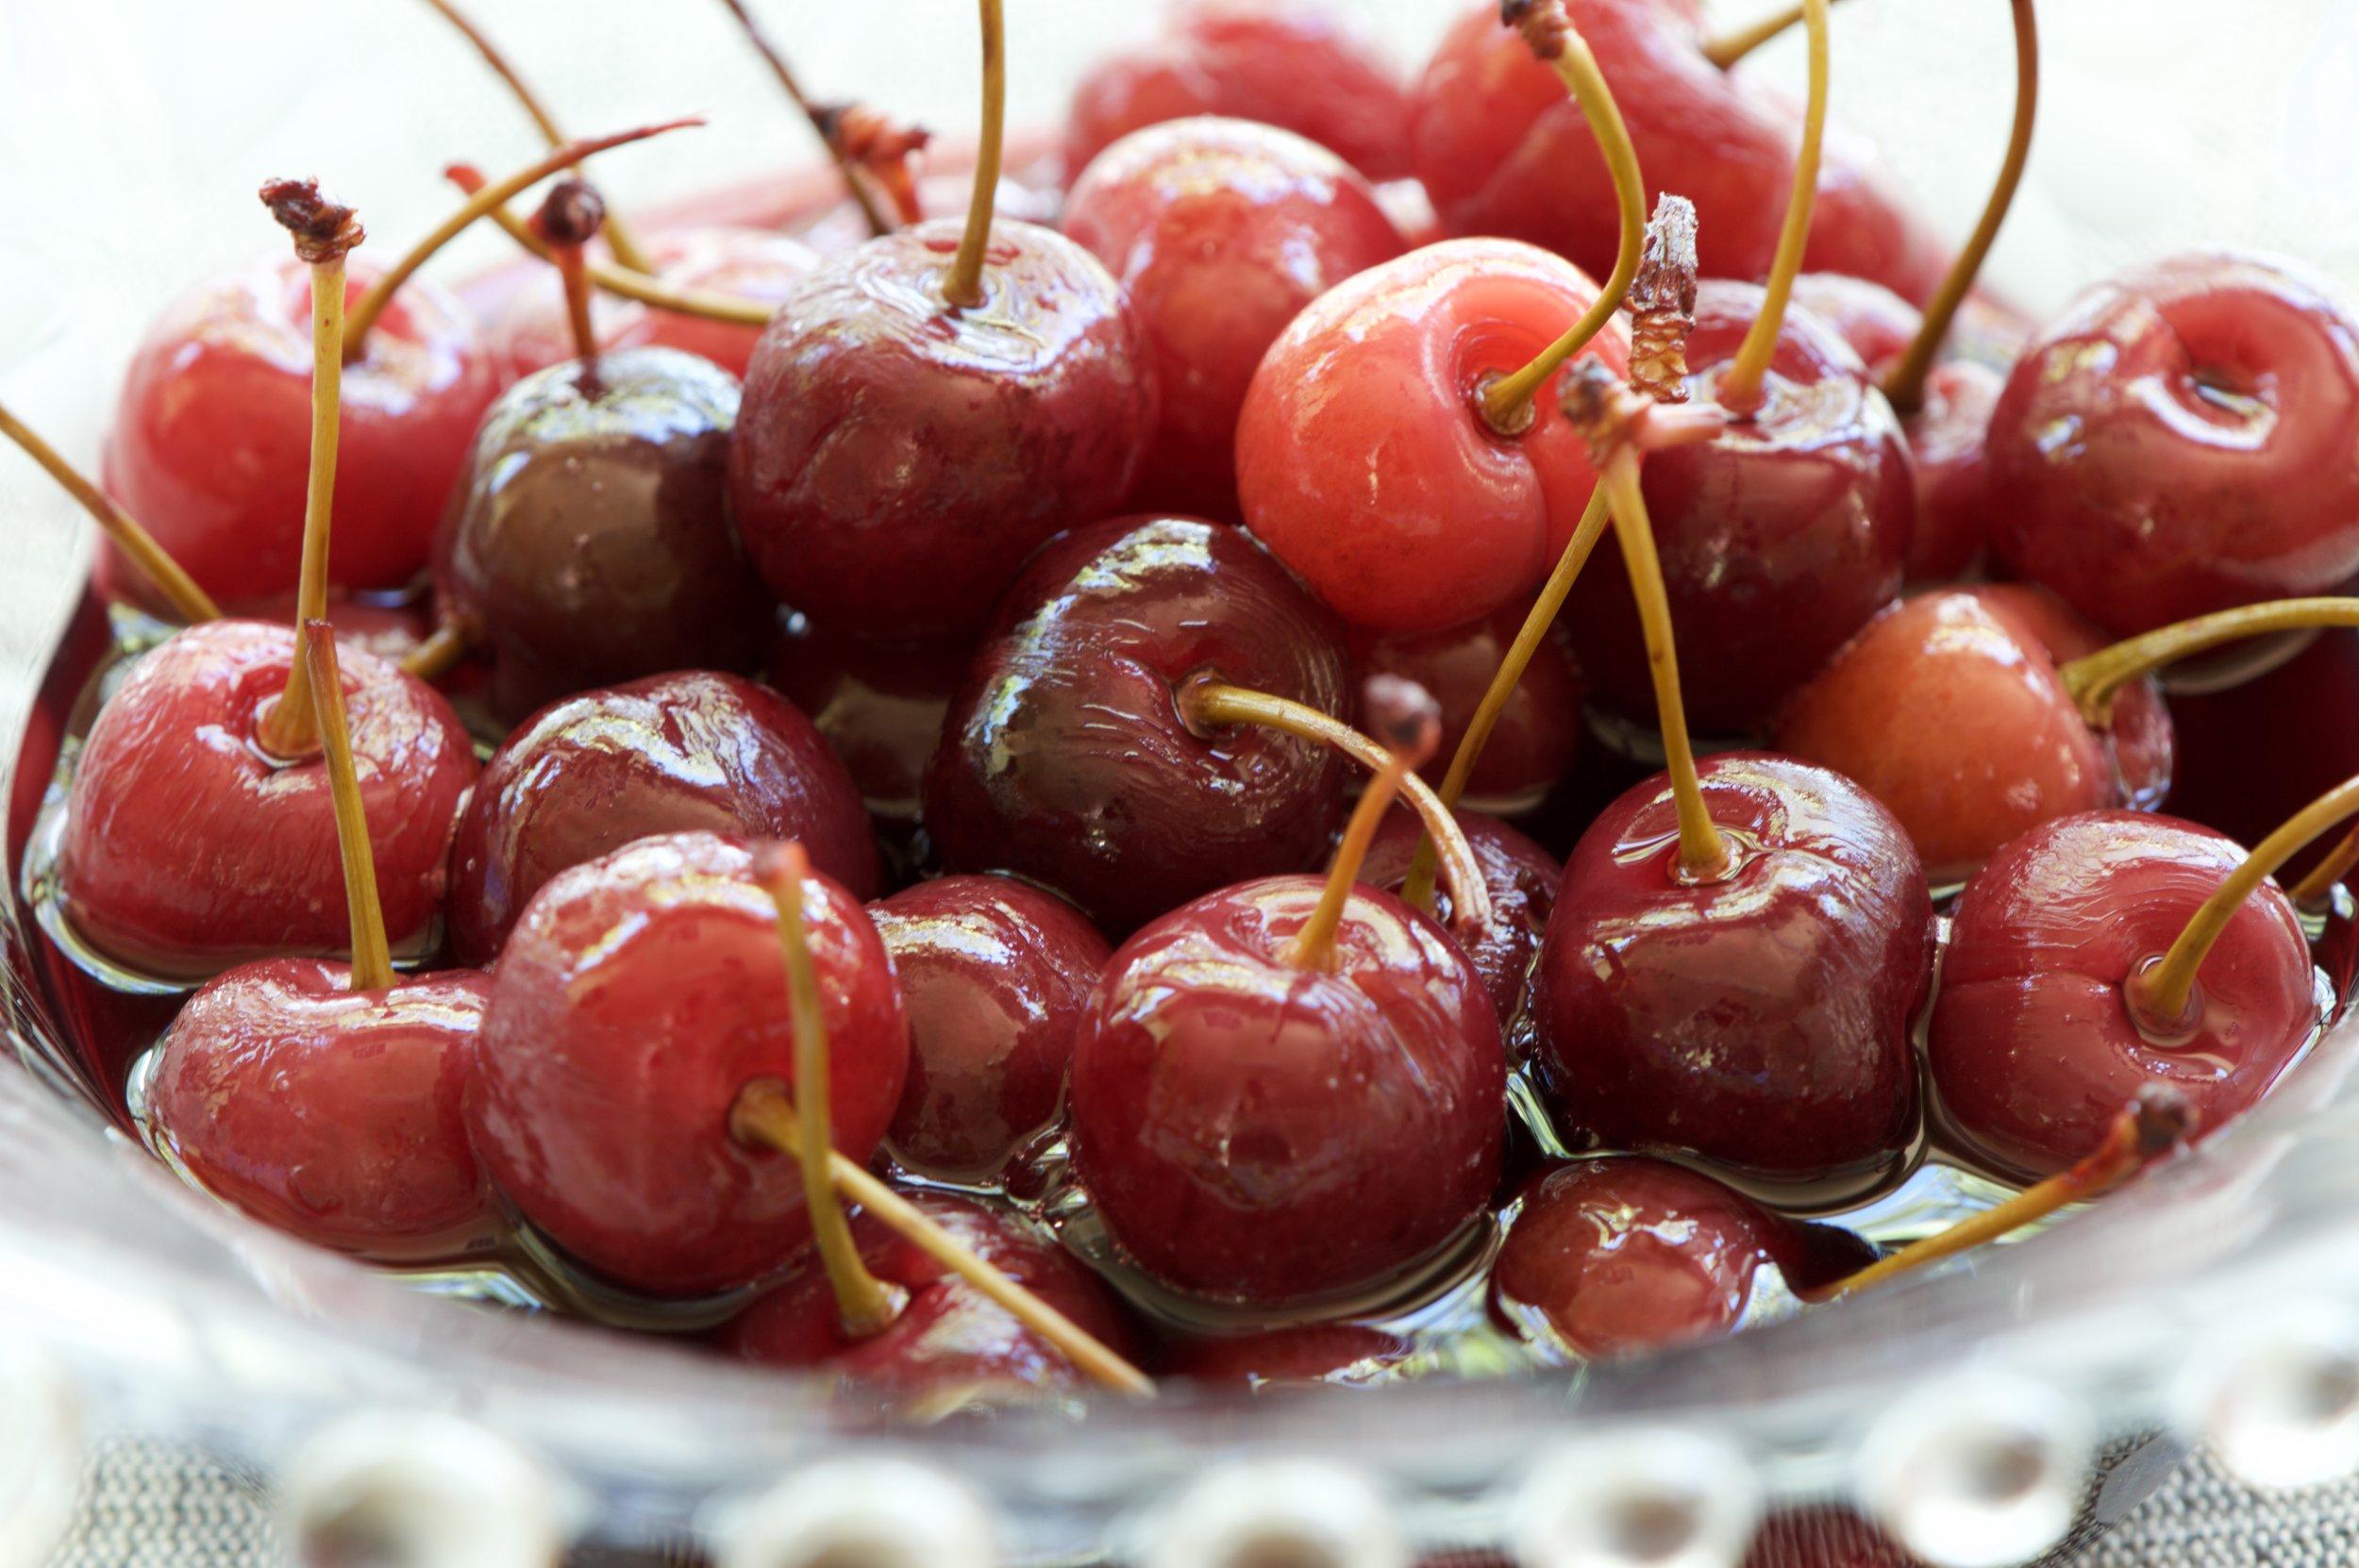 Cherries-CookingbyDesignLLC2018